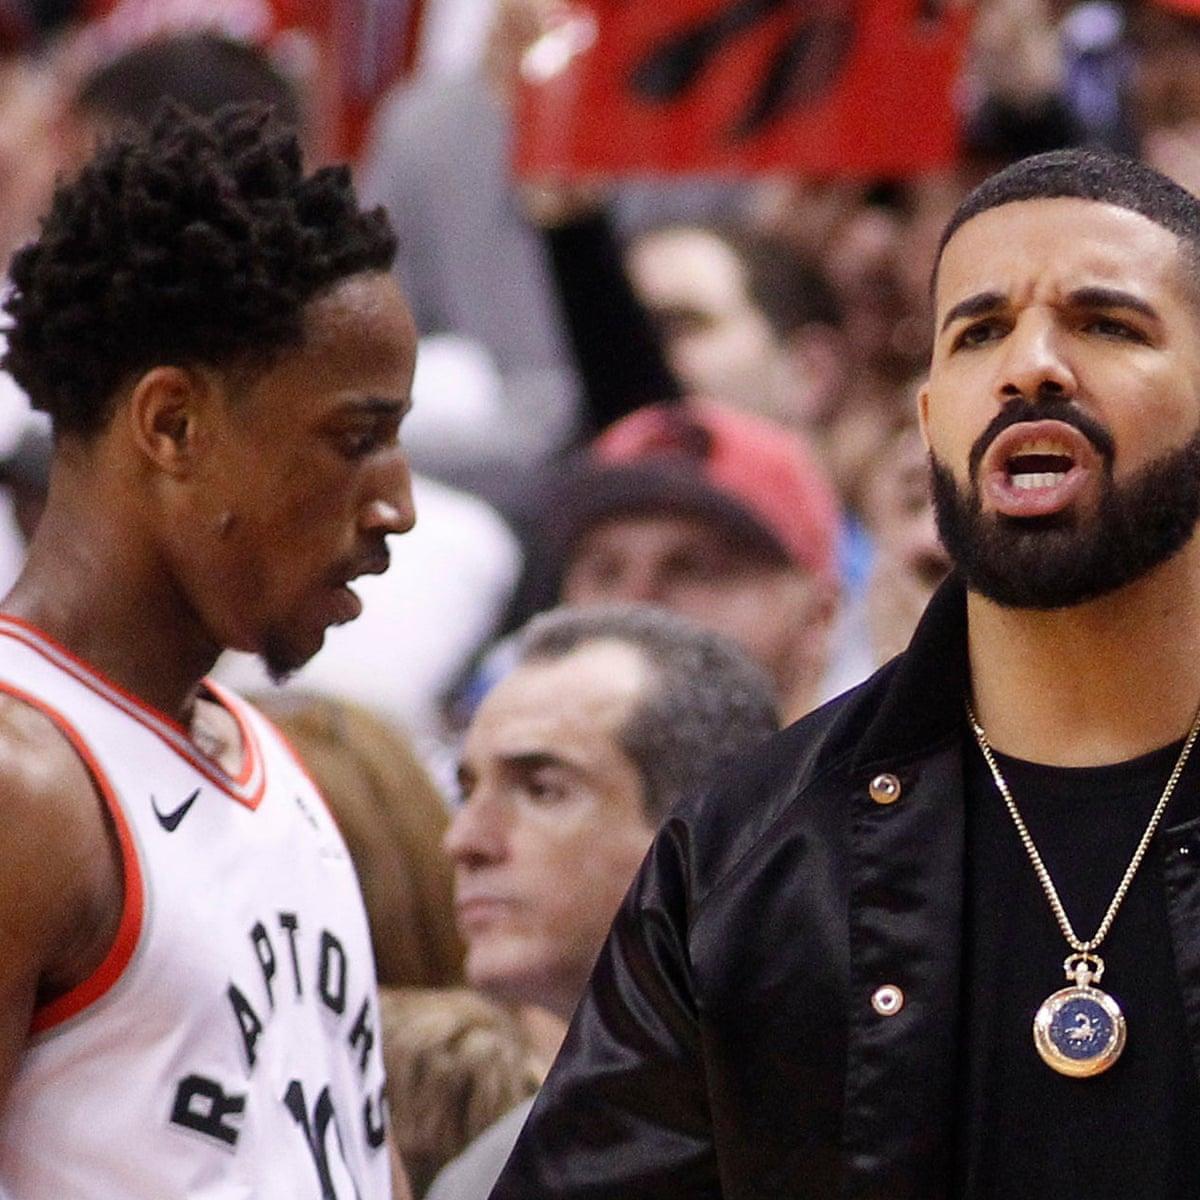 Drake Warned By Nba Over Bad Language At Basketball Game Drake The Guardian